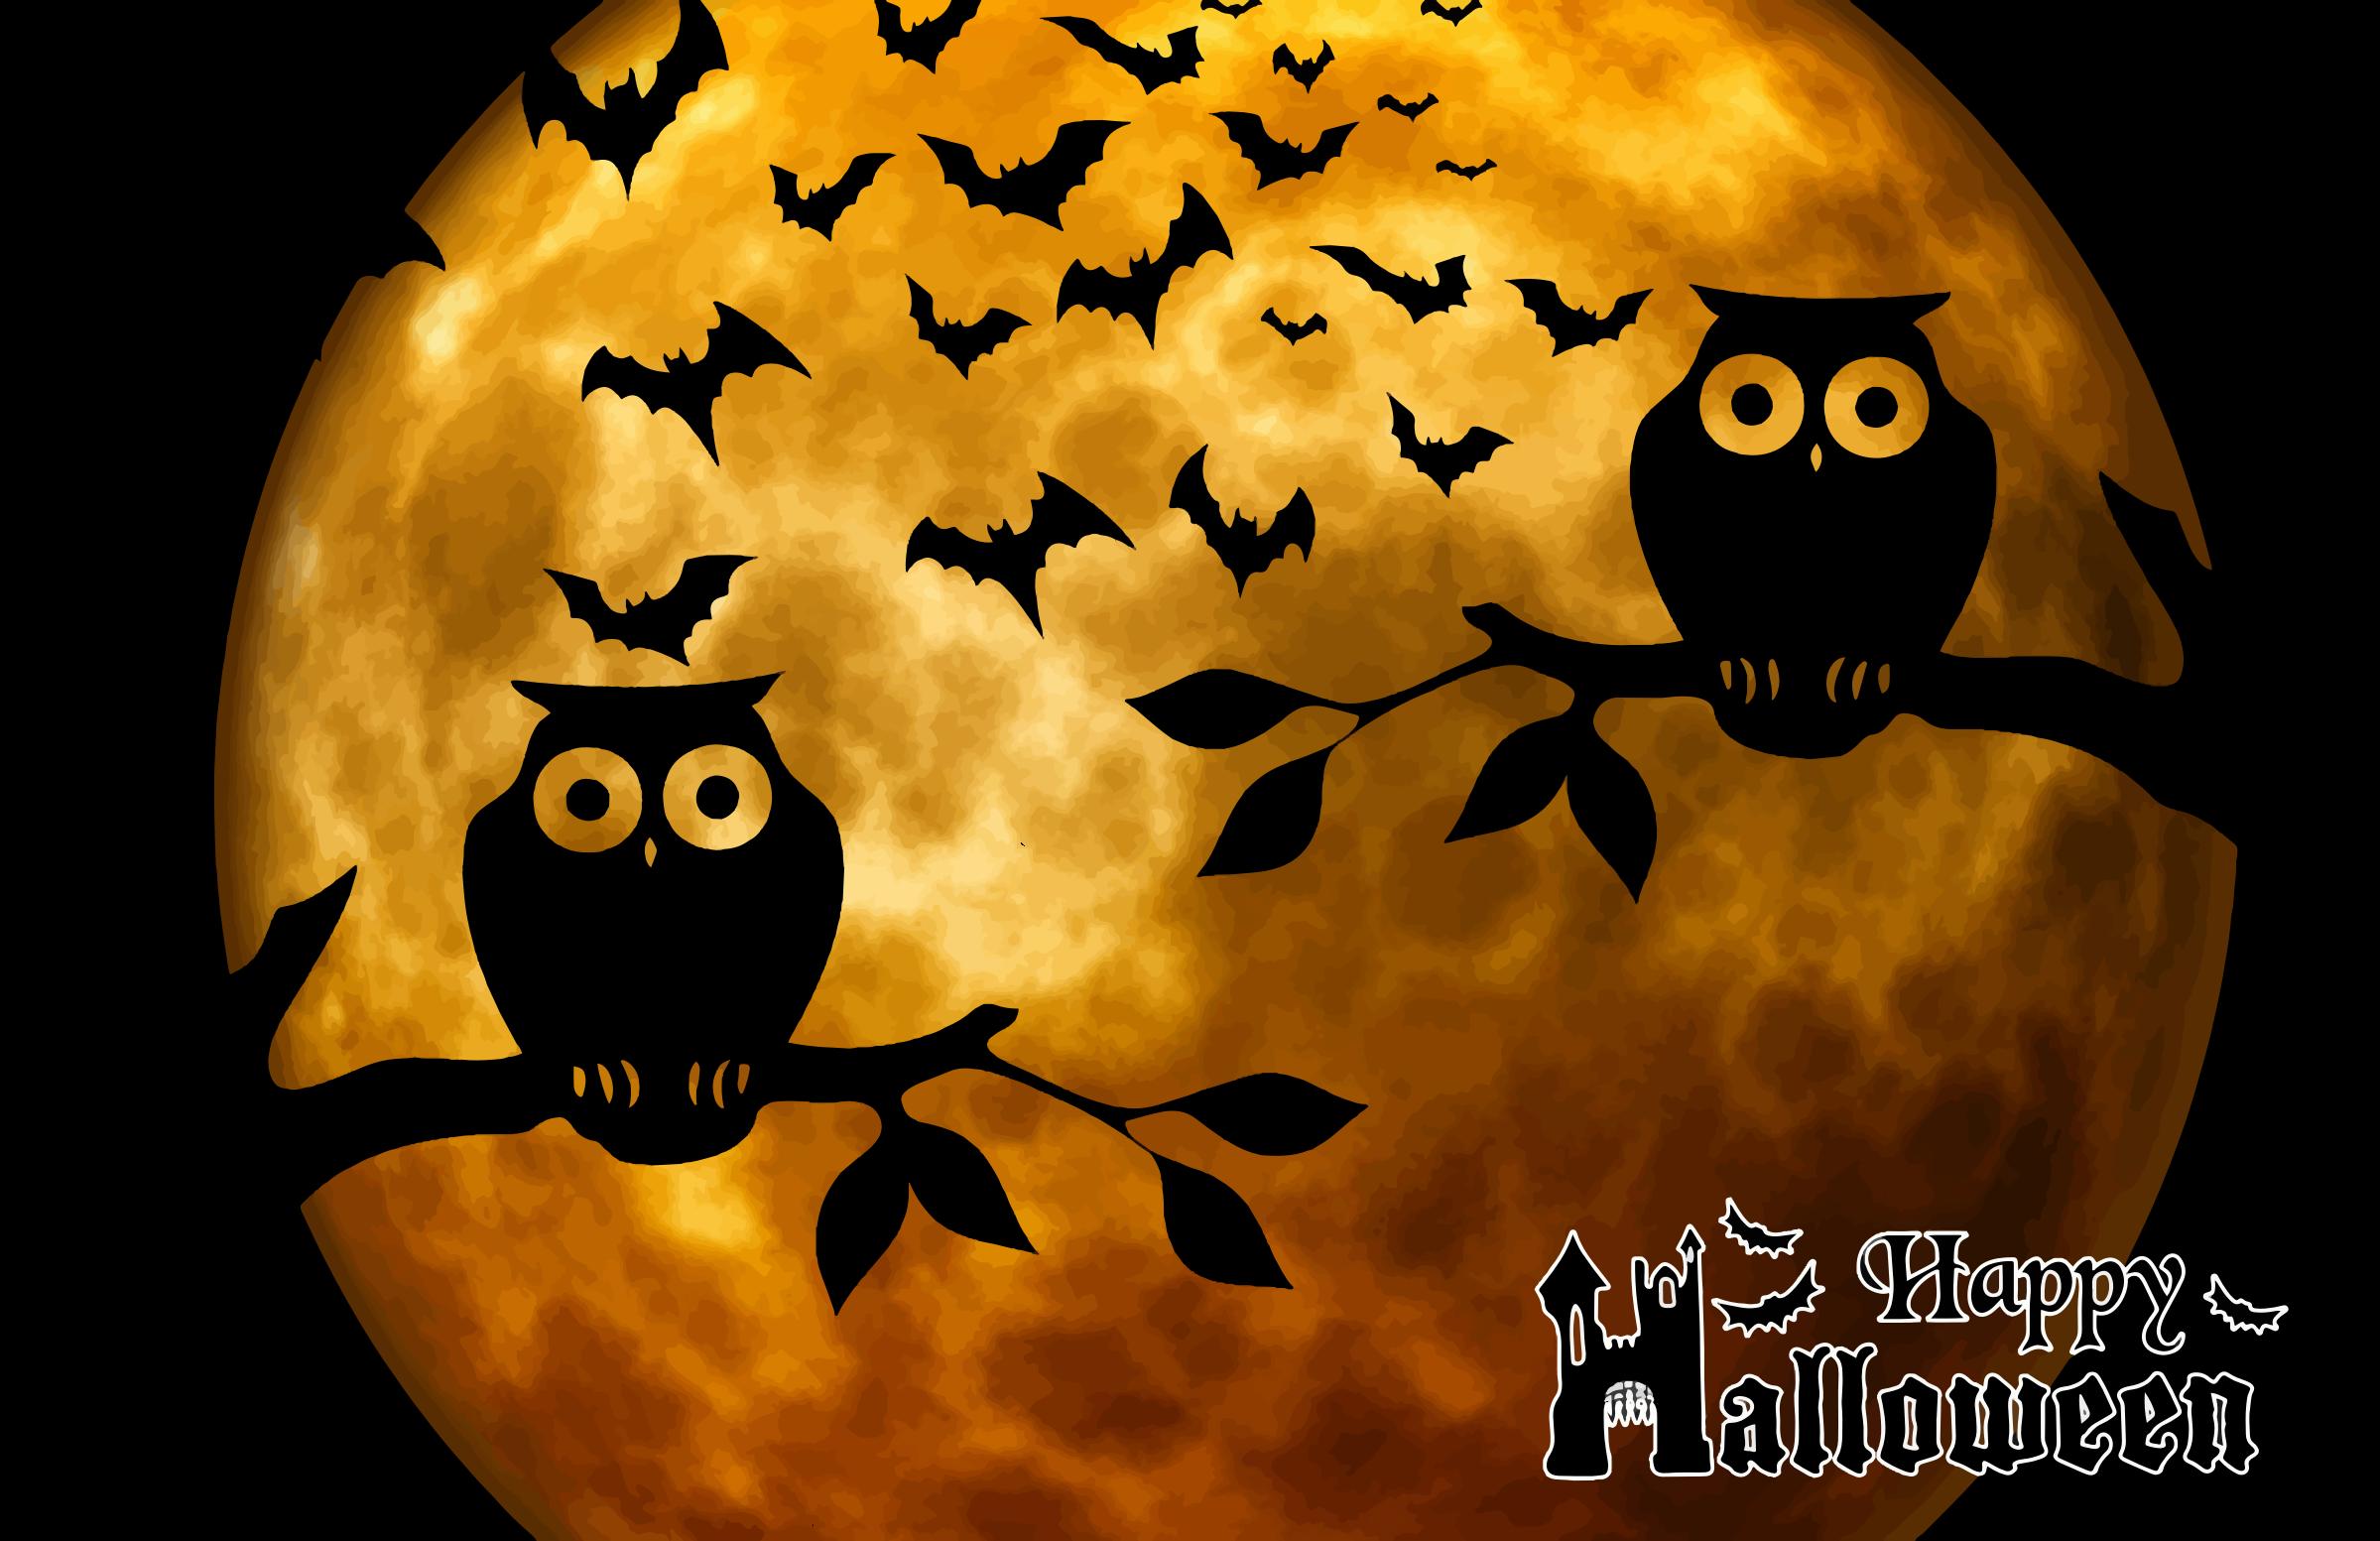 Happy Halloween Full Moon Background By Gdj Pixabay On Openclipart Halloween Owl Halloween Full Moon Halloween Cross Stitch Patterns